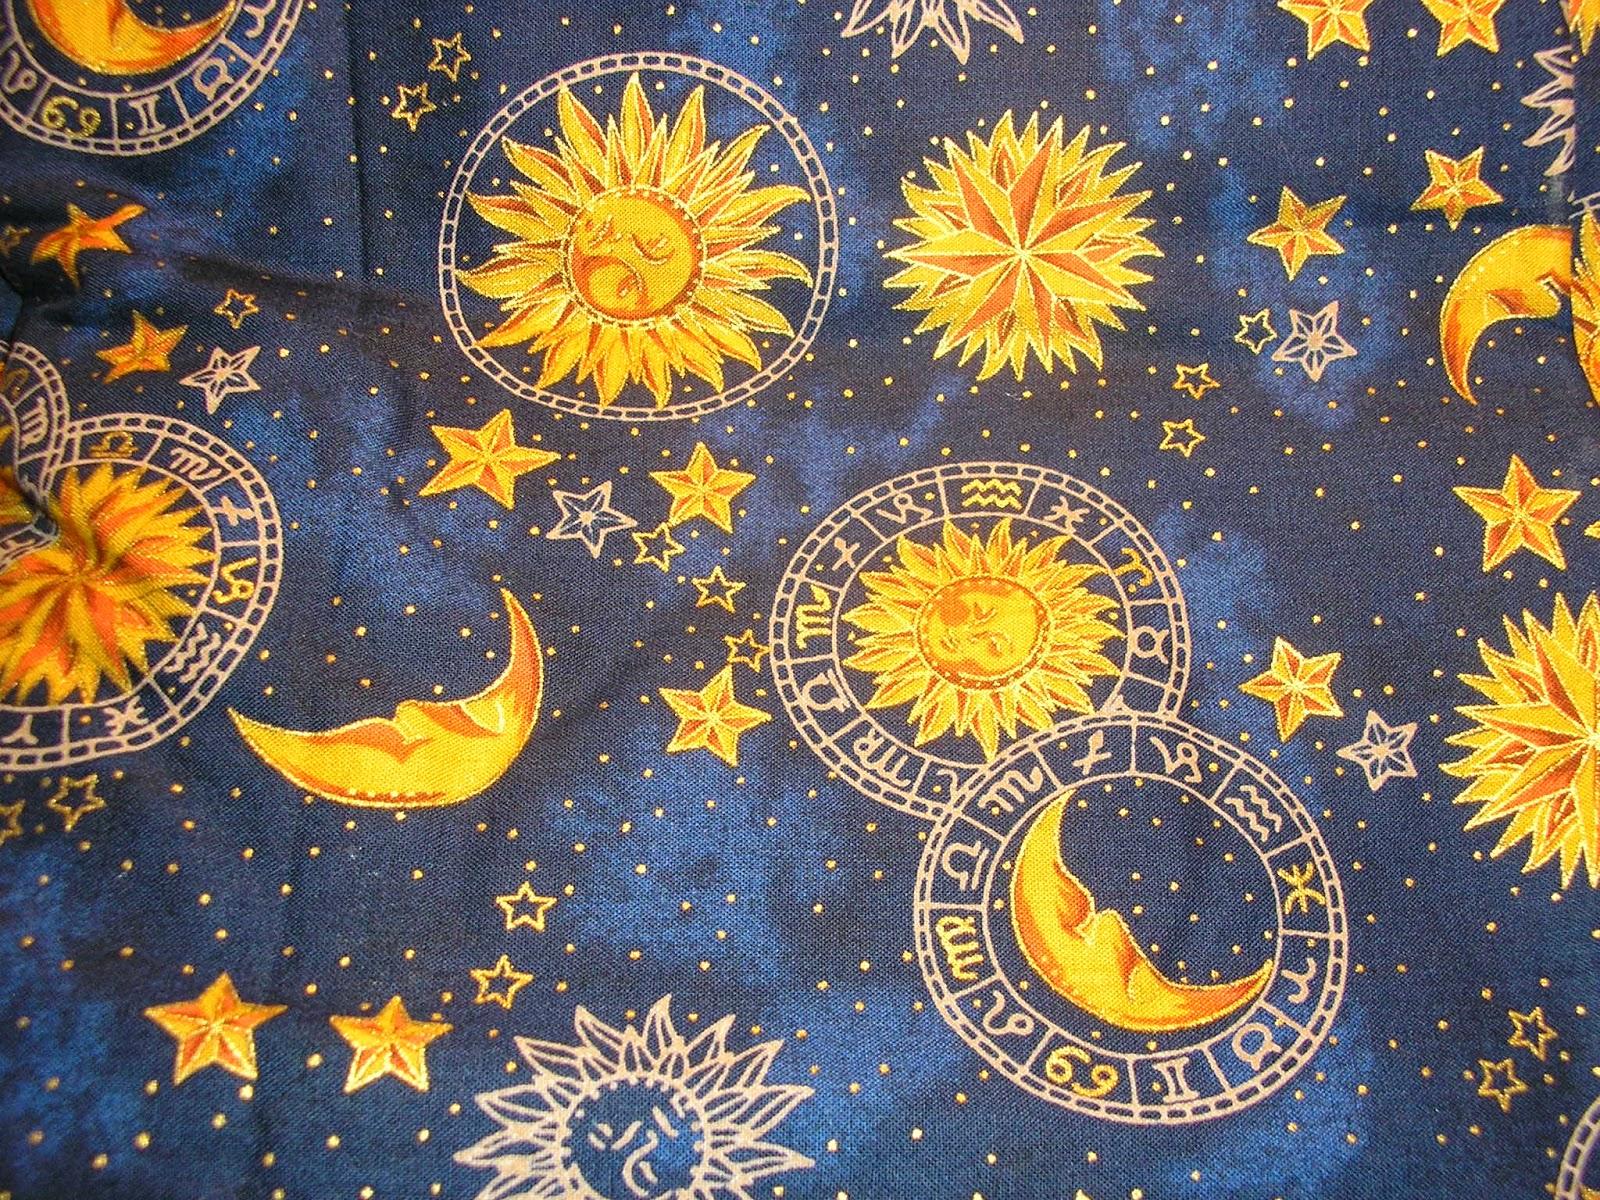 Celestial Sun and Moon Wallpaper - WallpaperSafari